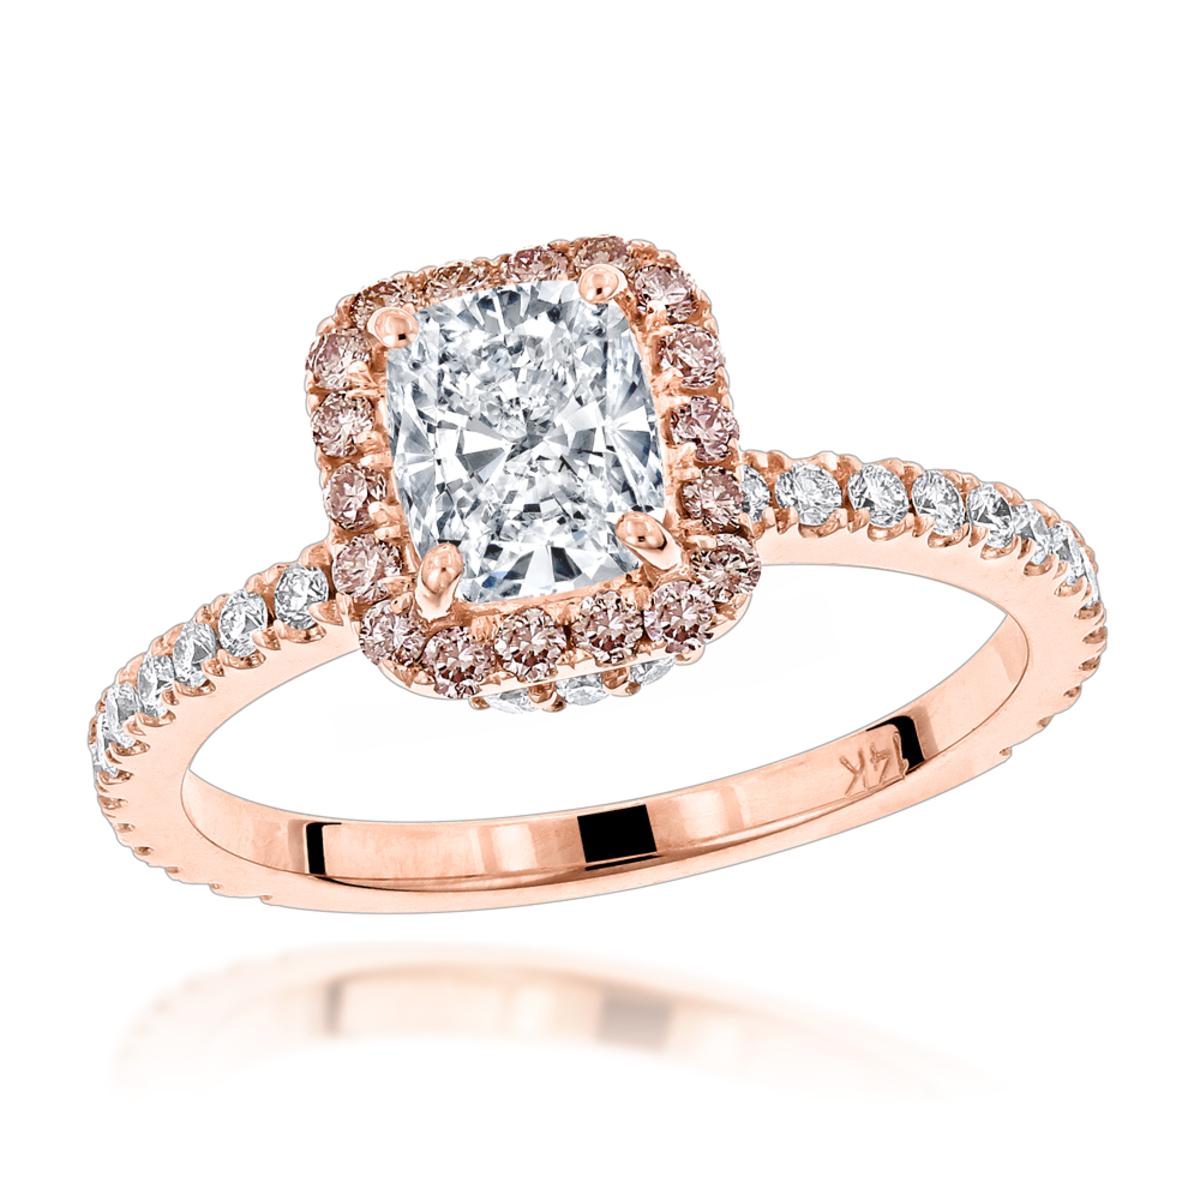 14K Gold Cushion Cut White Pink Diamond Halo Engagement Ring 2.1ct